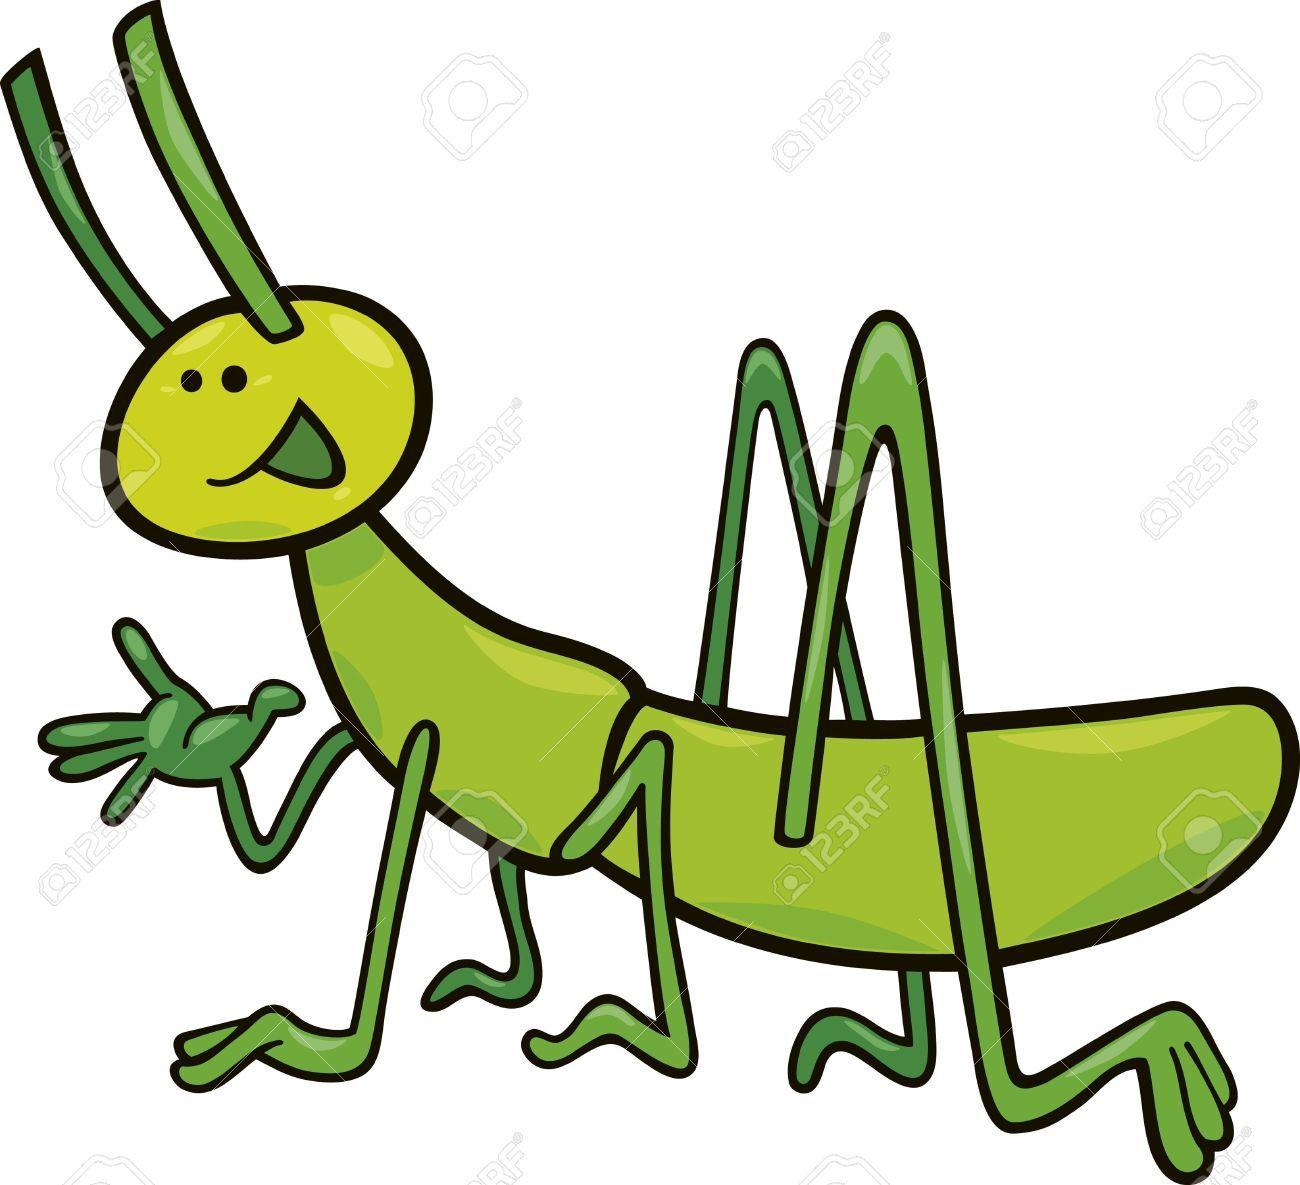 Cricket bug clipart png download Cricket bug clipart 2 » Clipart Portal png download